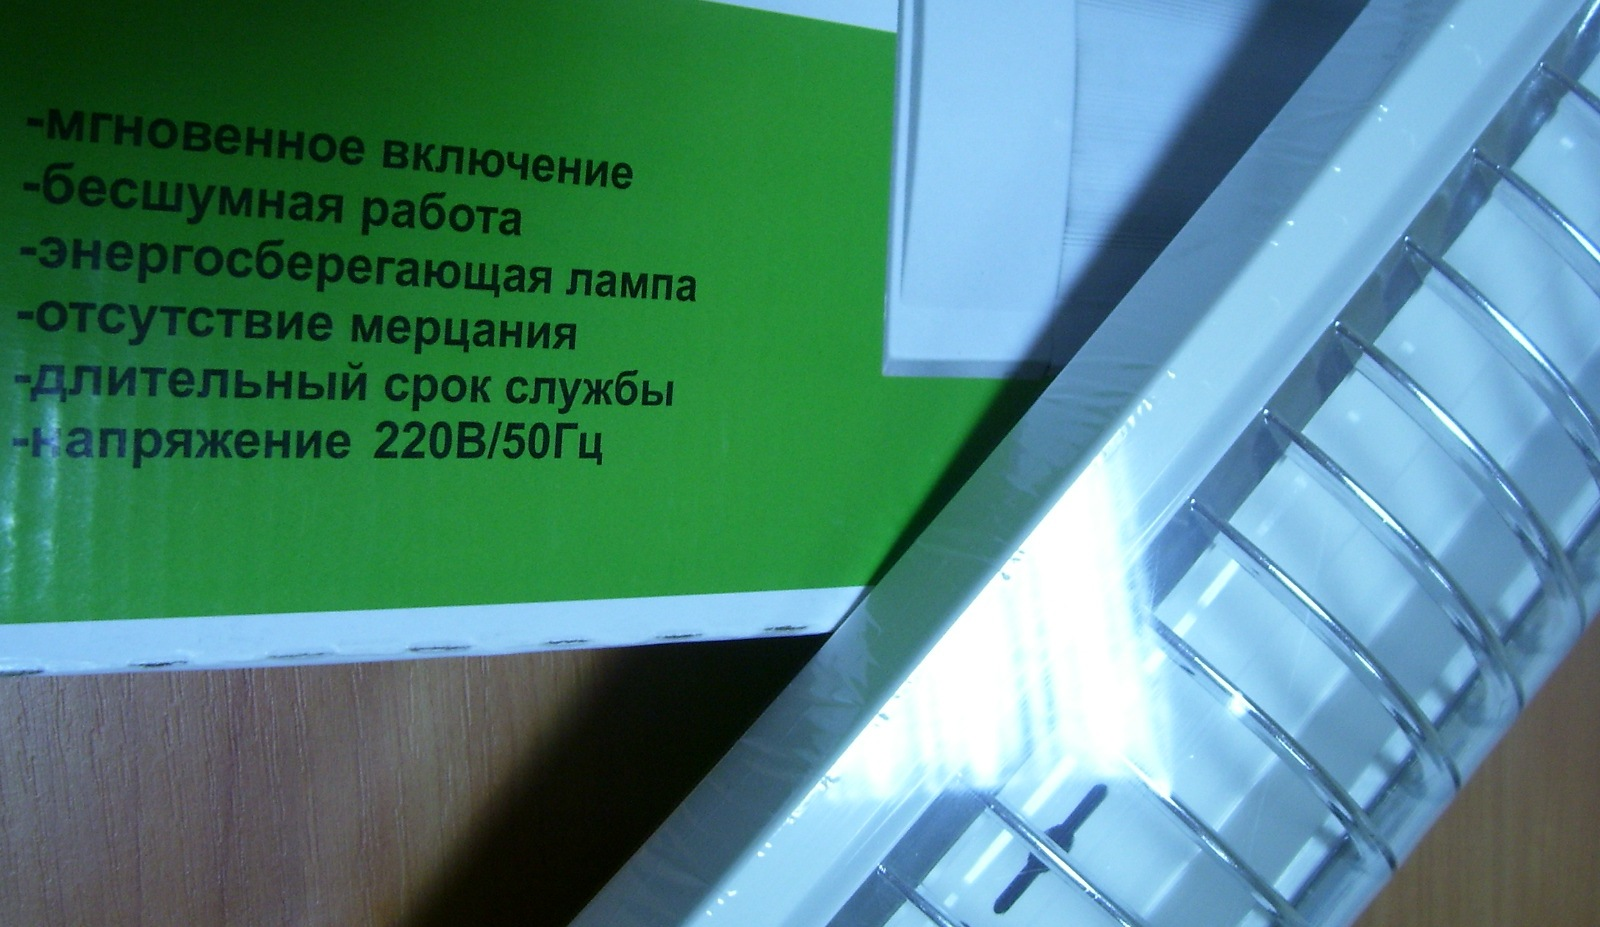 Светильник ЛПО 2х40 с ЭПРА